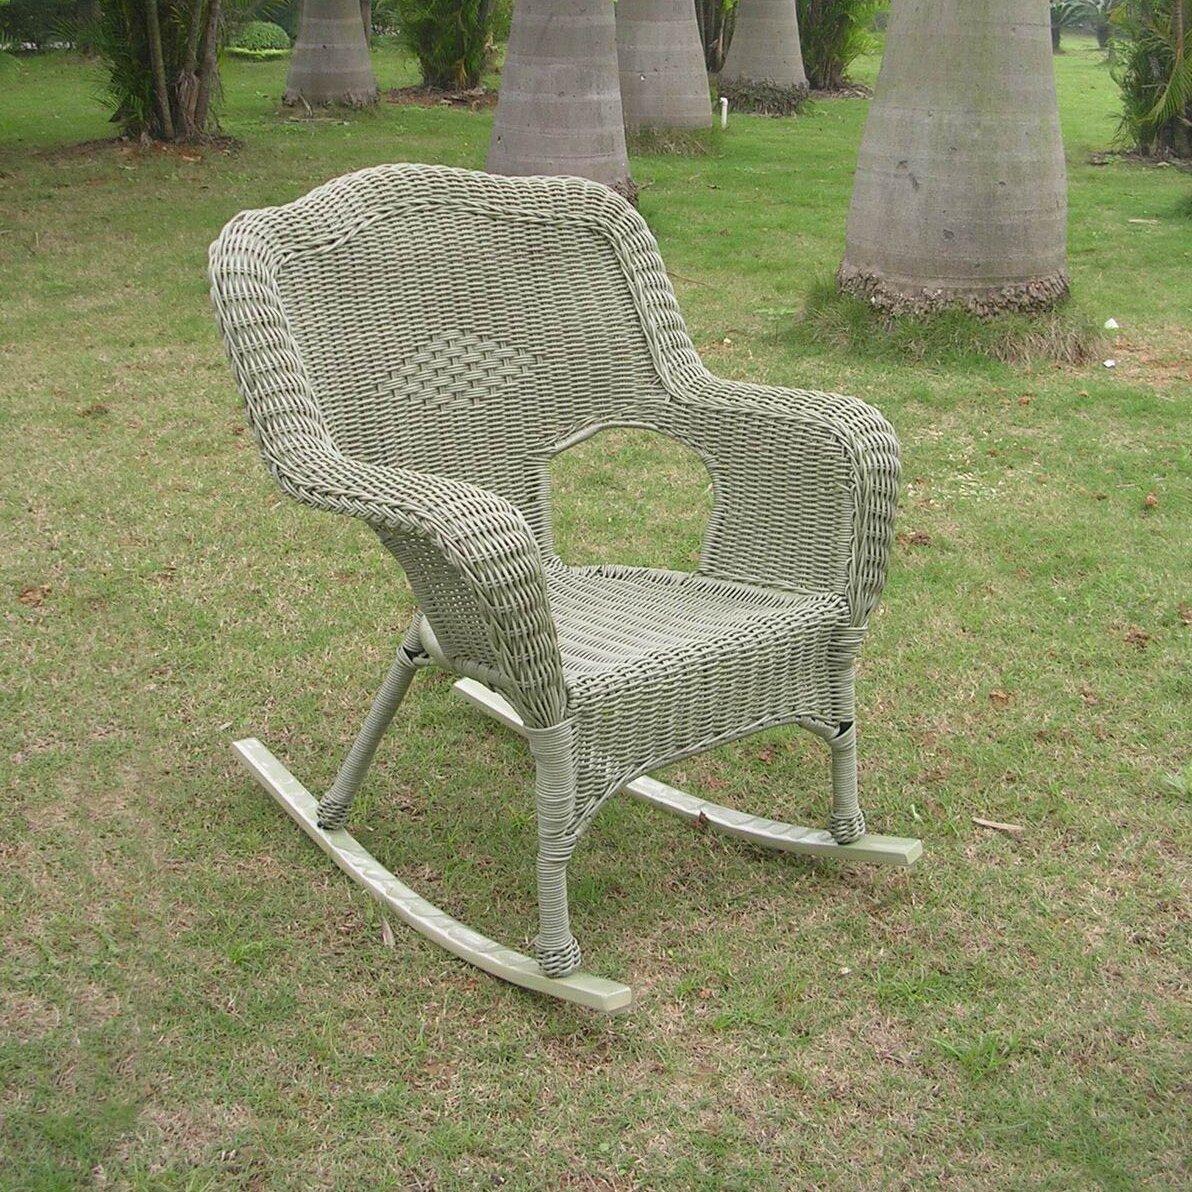 International Caravan Chelsea Outdoor Wicker Resin Patio Rocking Chair &